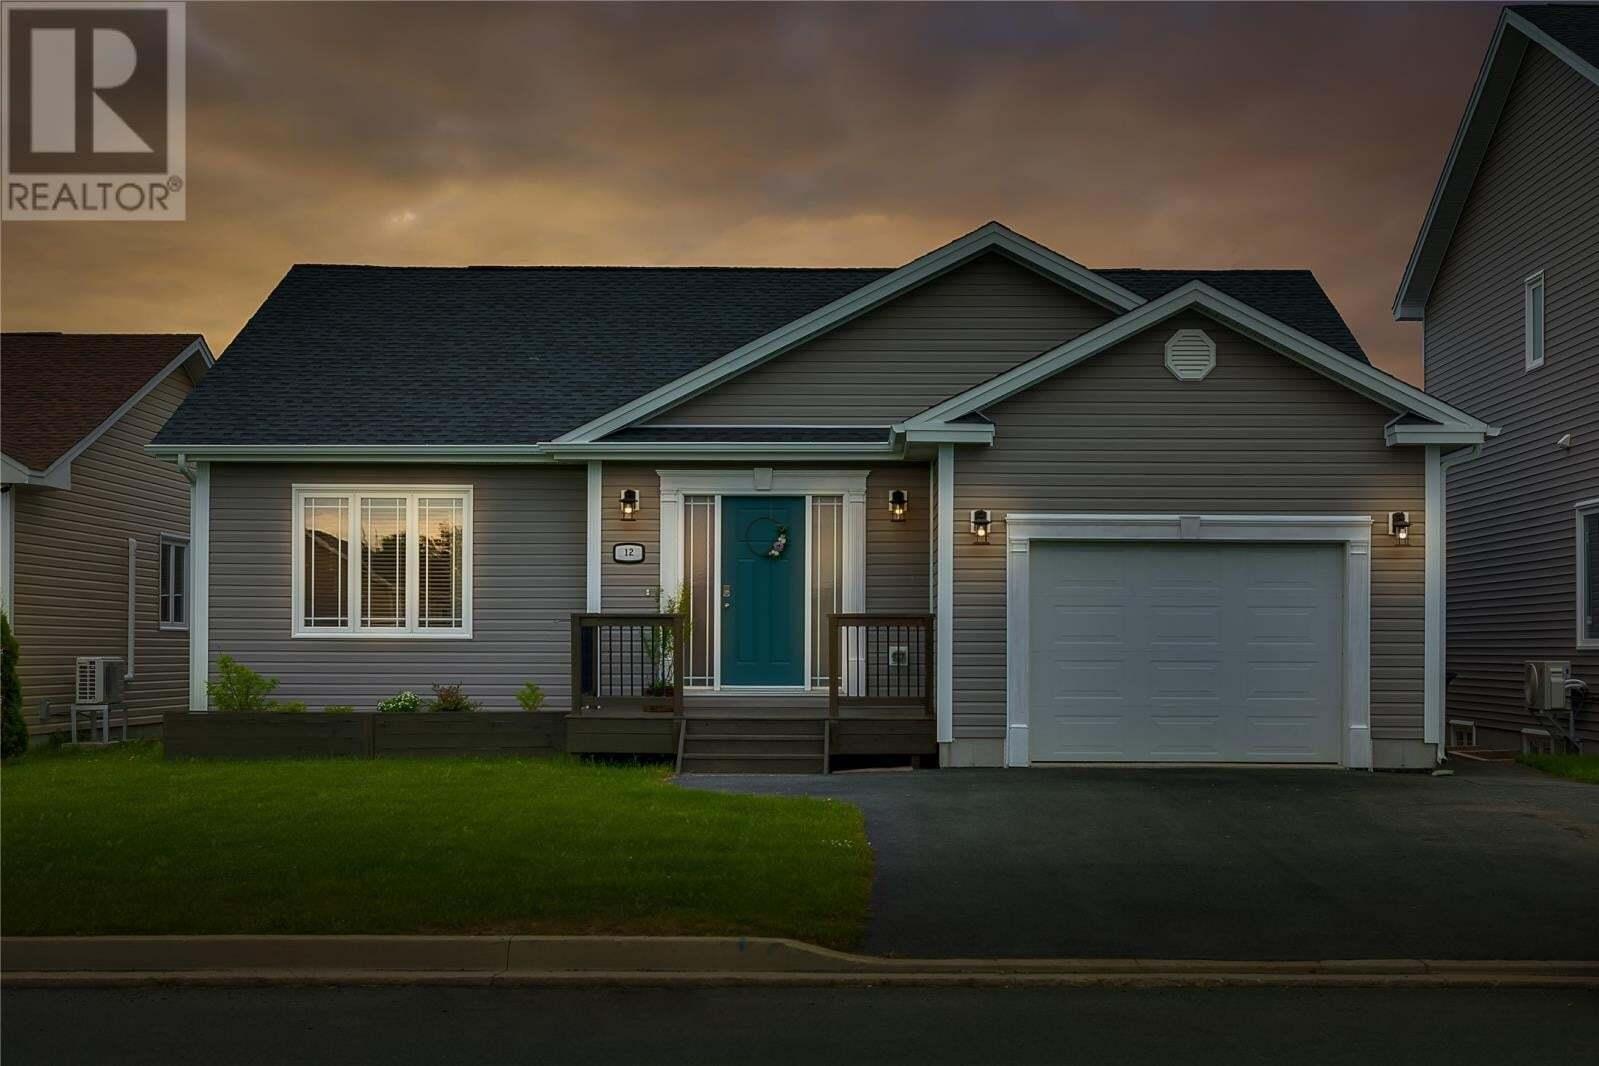 House for sale at 12 Tullamore St St. John's Newfoundland - MLS: 1222621